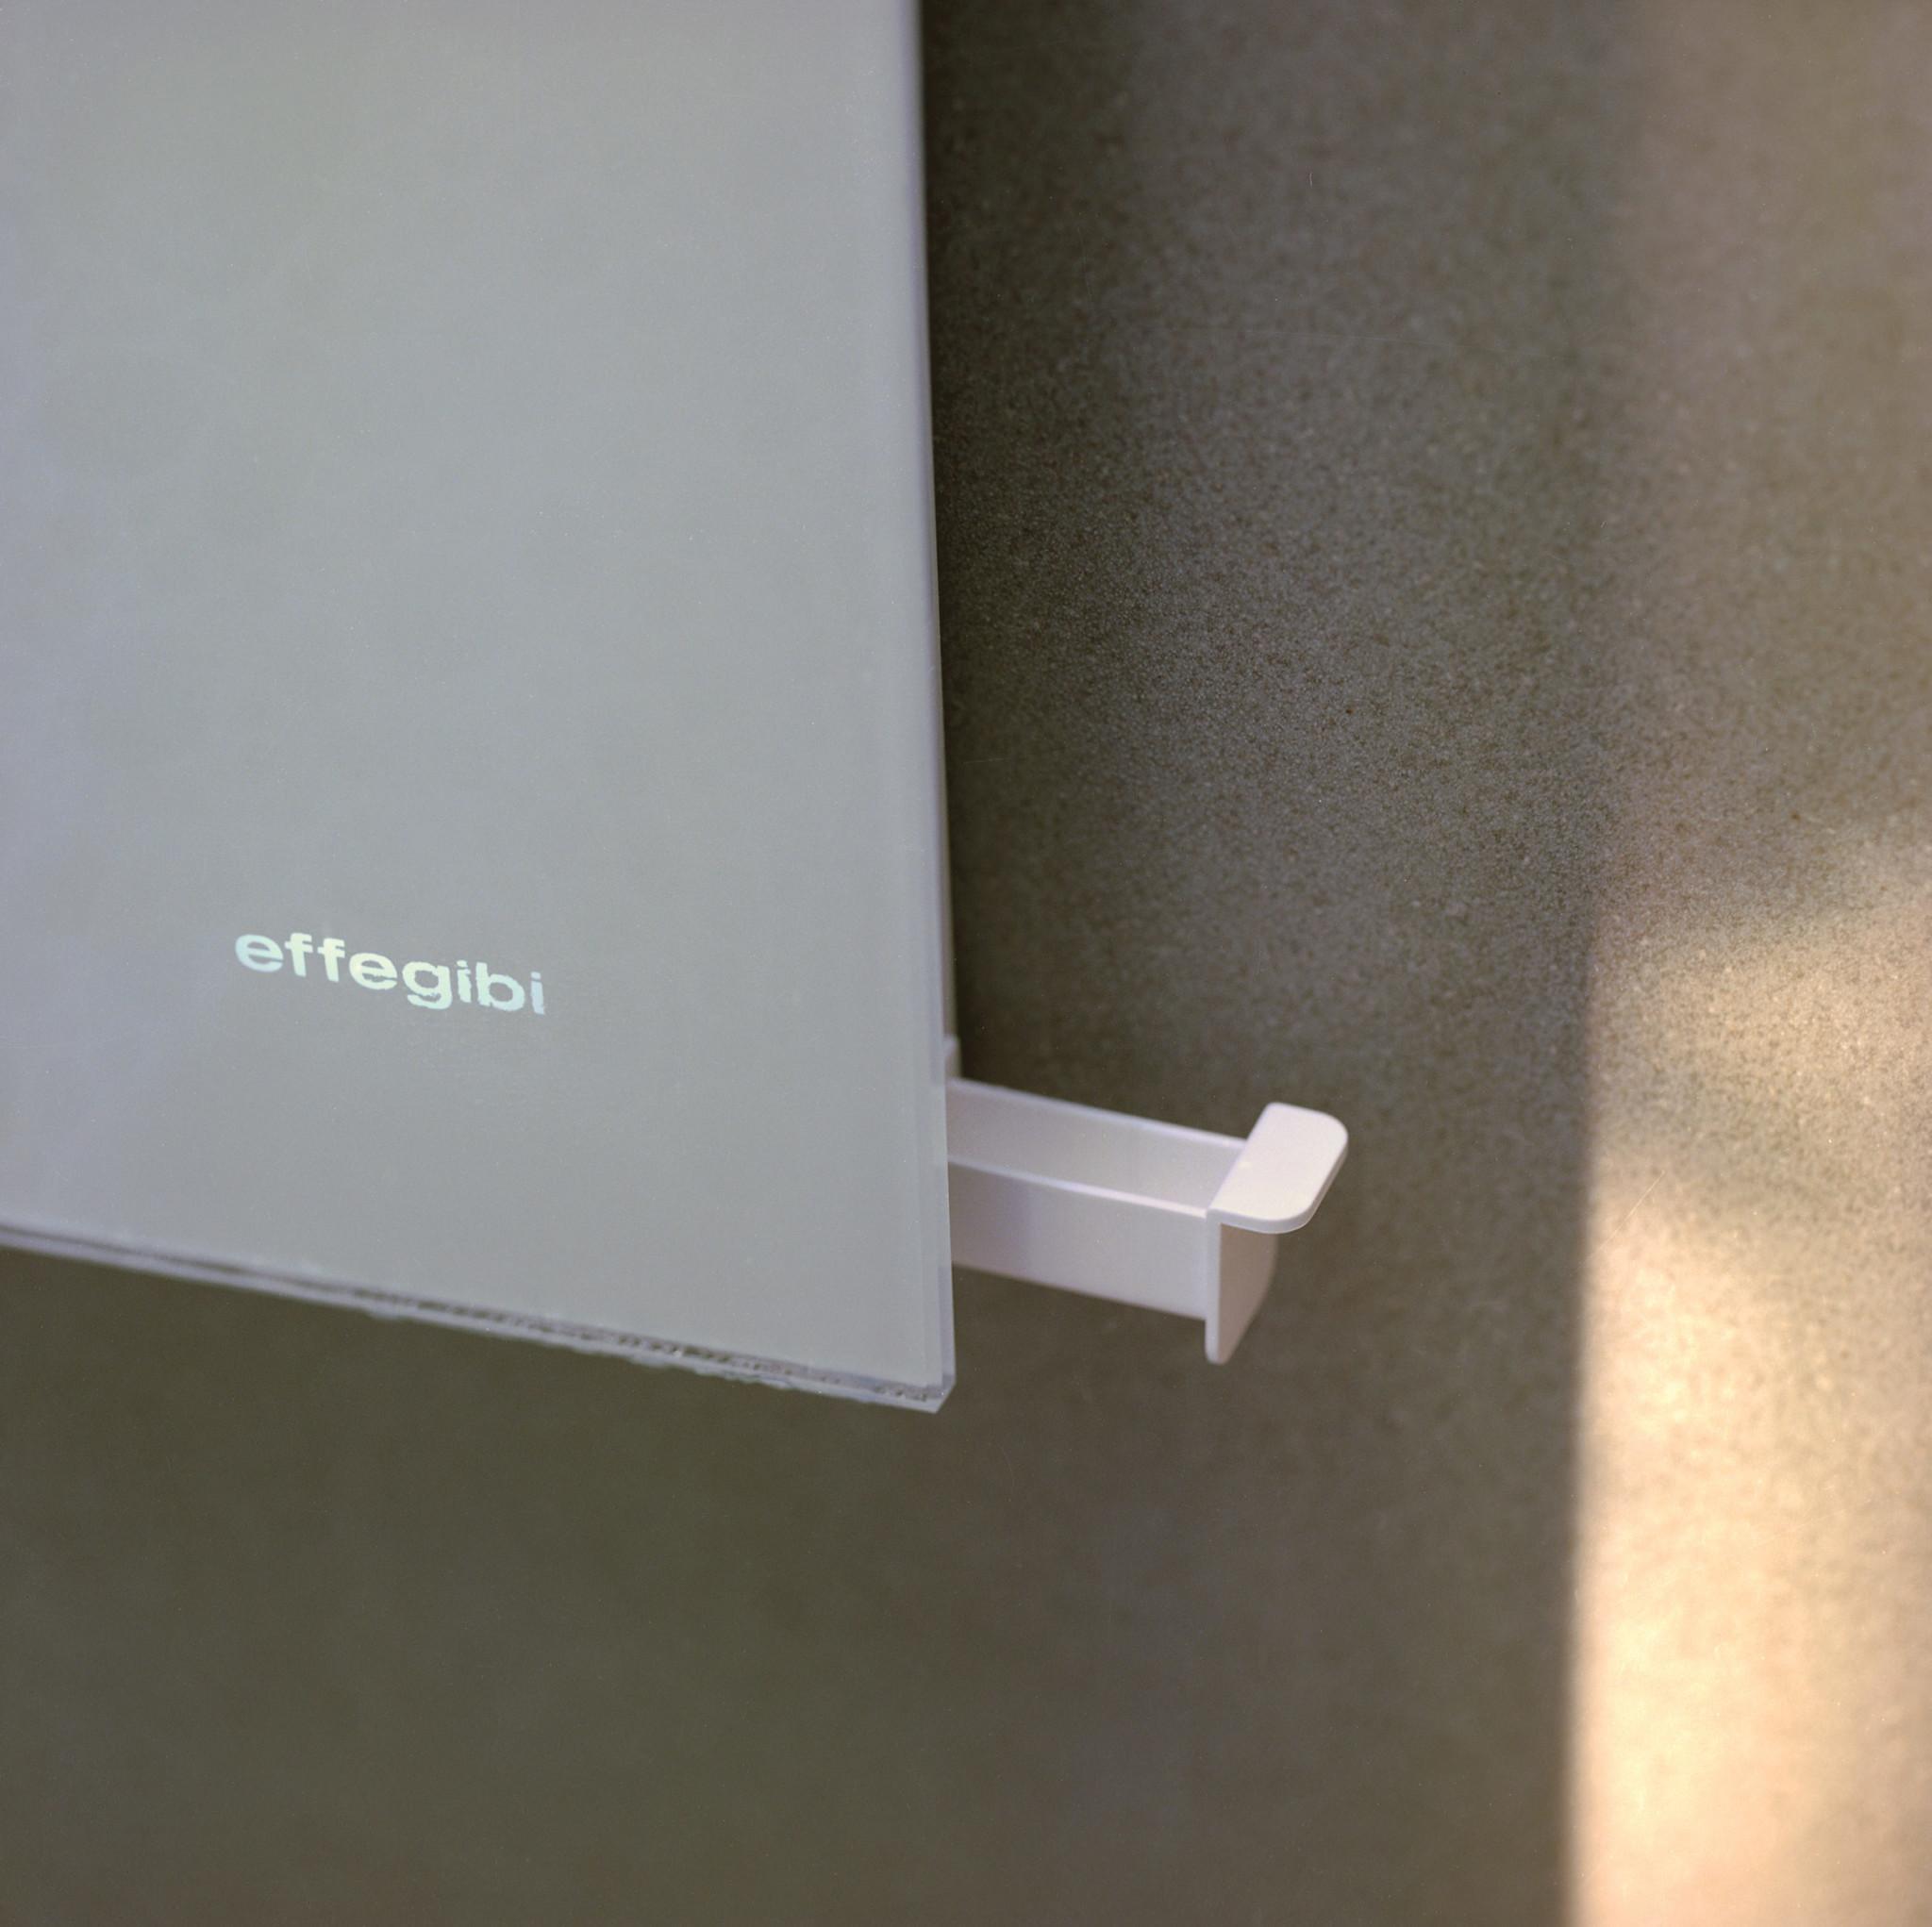 dampfgenerator touch steam effegibi. Black Bedroom Furniture Sets. Home Design Ideas